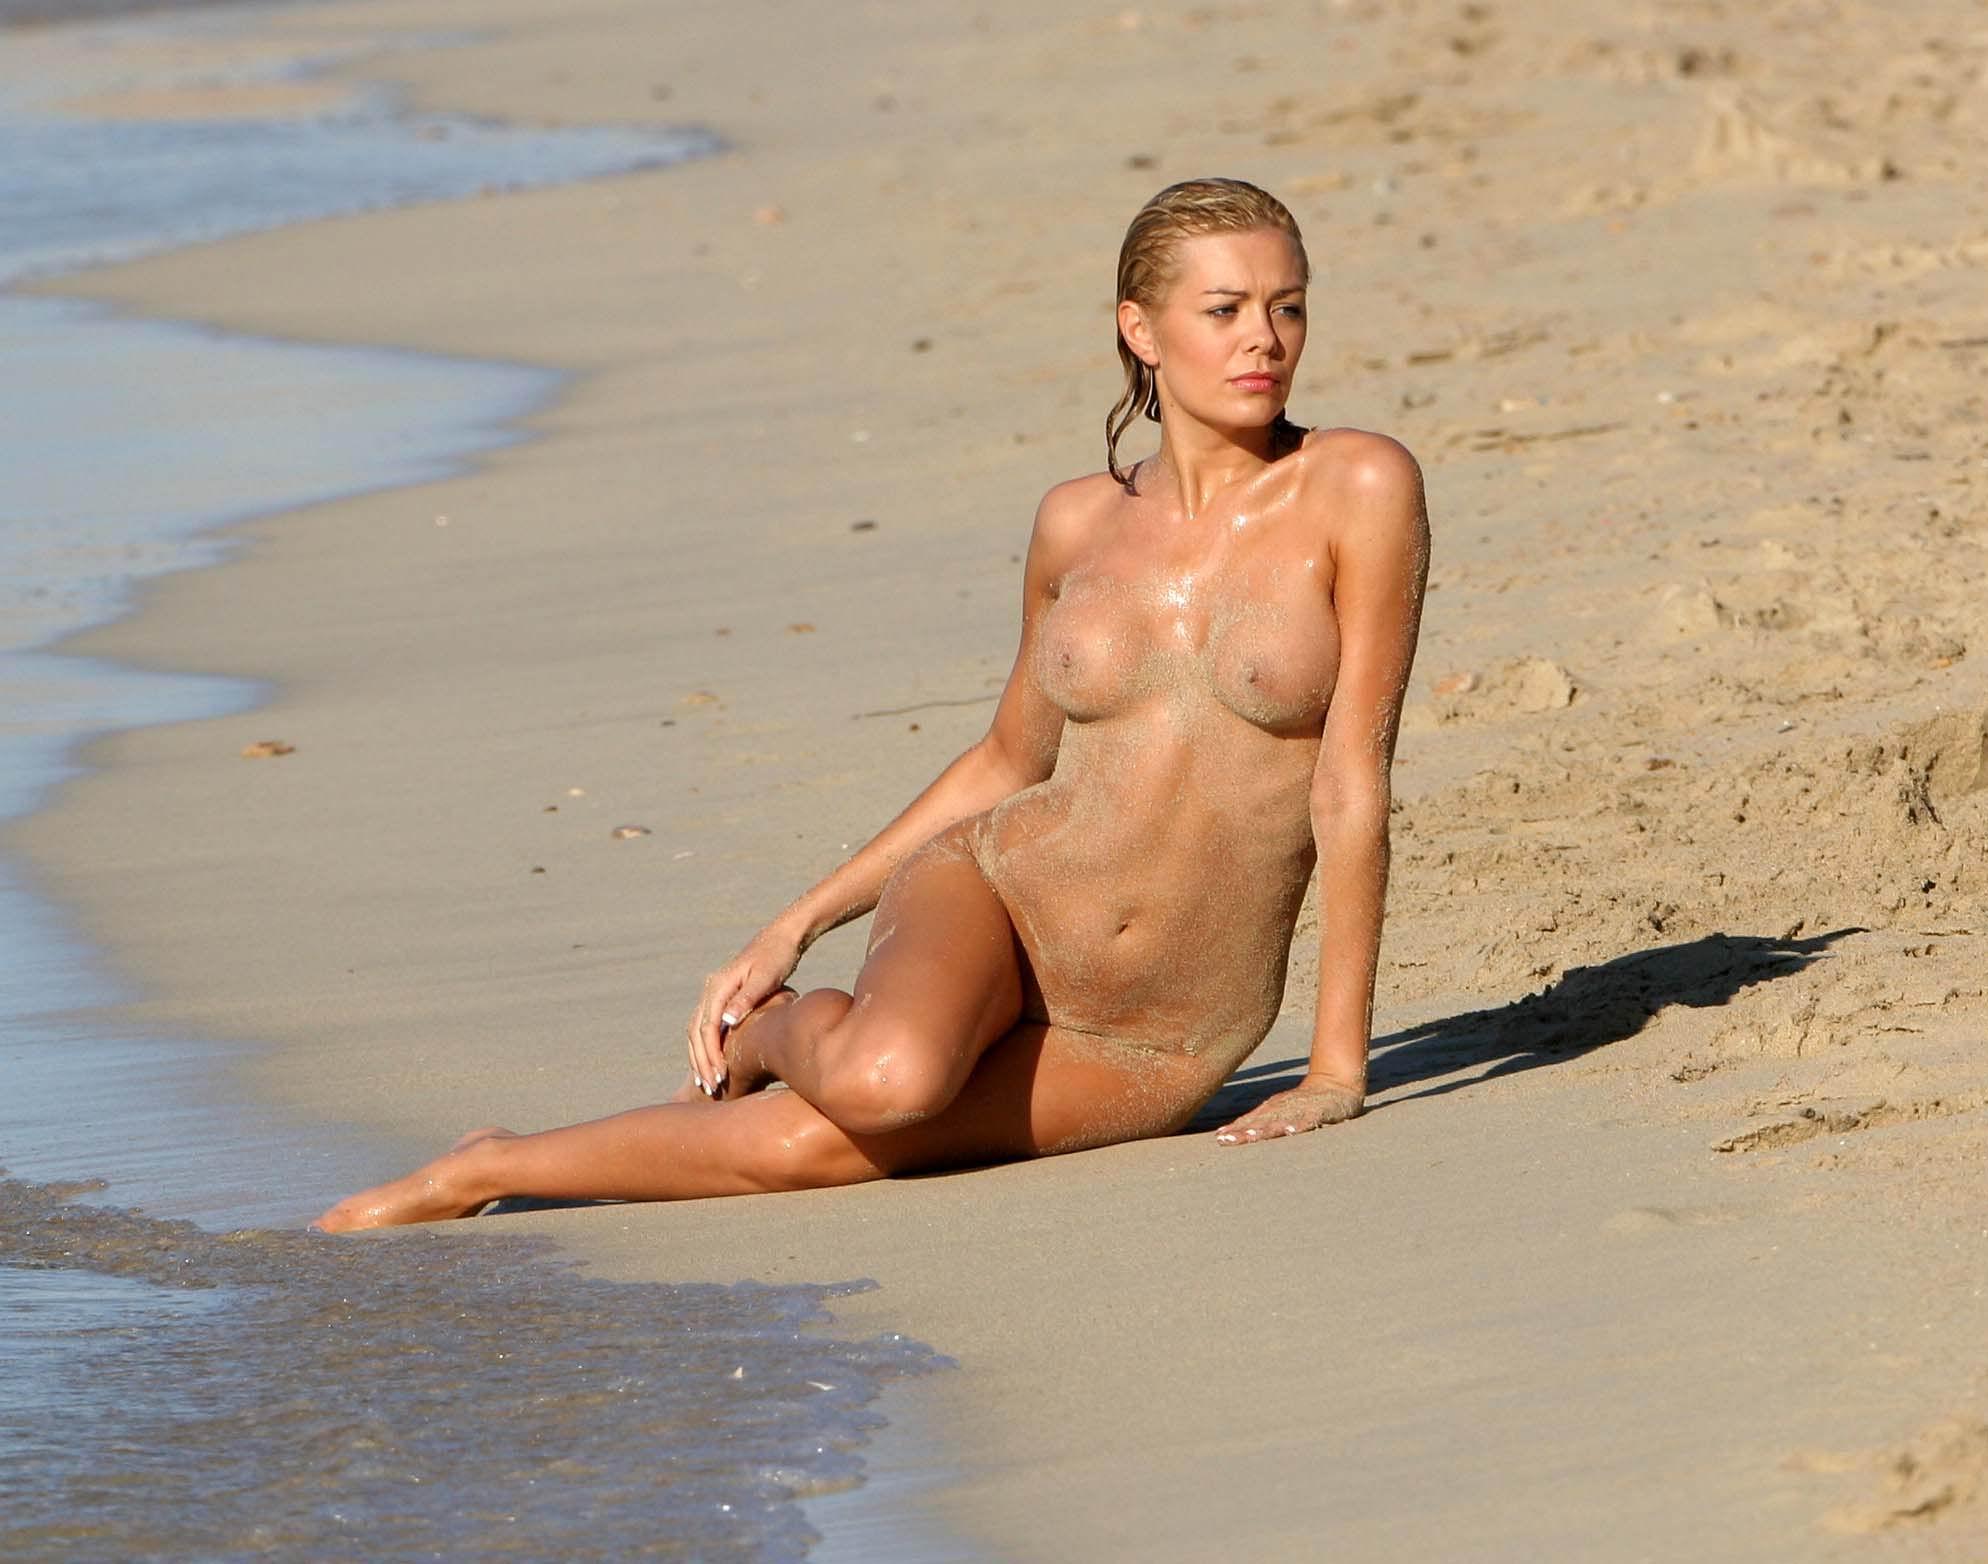 Daily Nude Celebrity Galleries! - NUDE